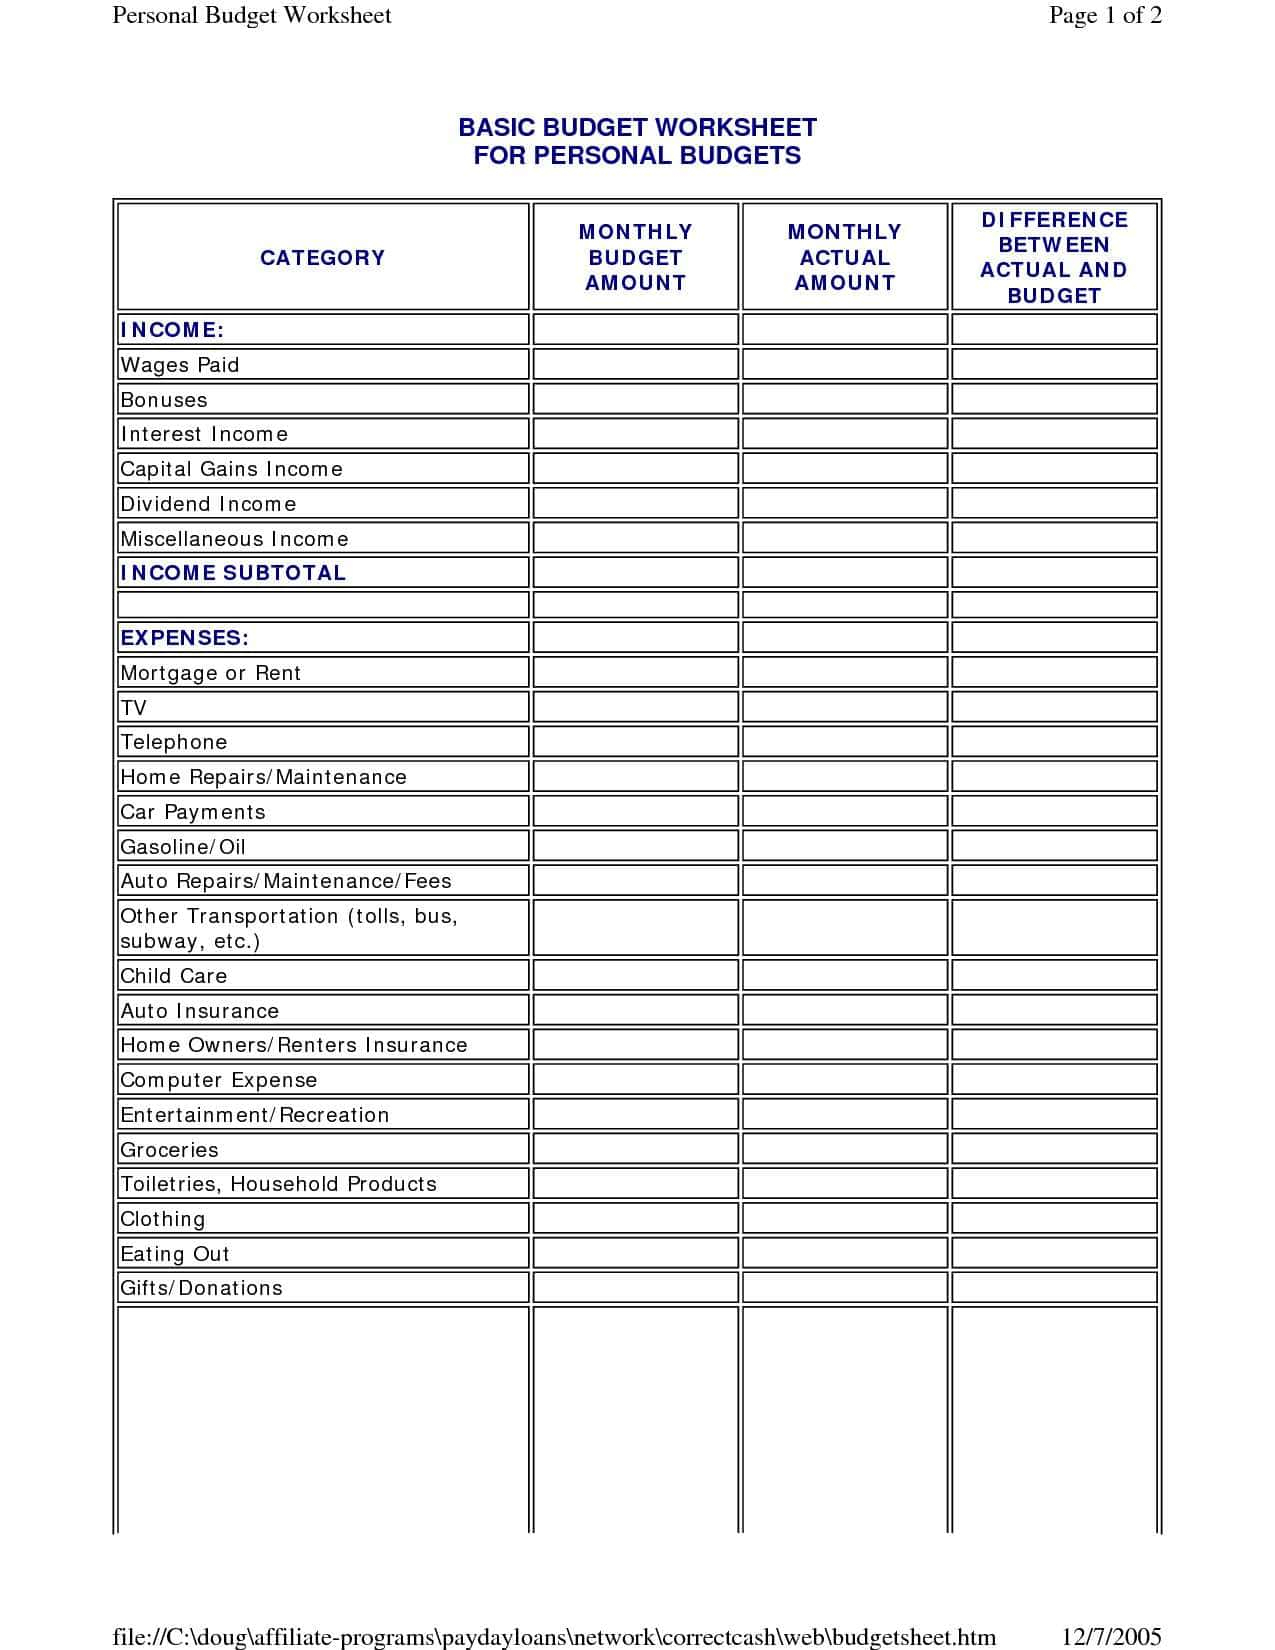 Online Budget Spreadsheet With Online Budget Worksheet